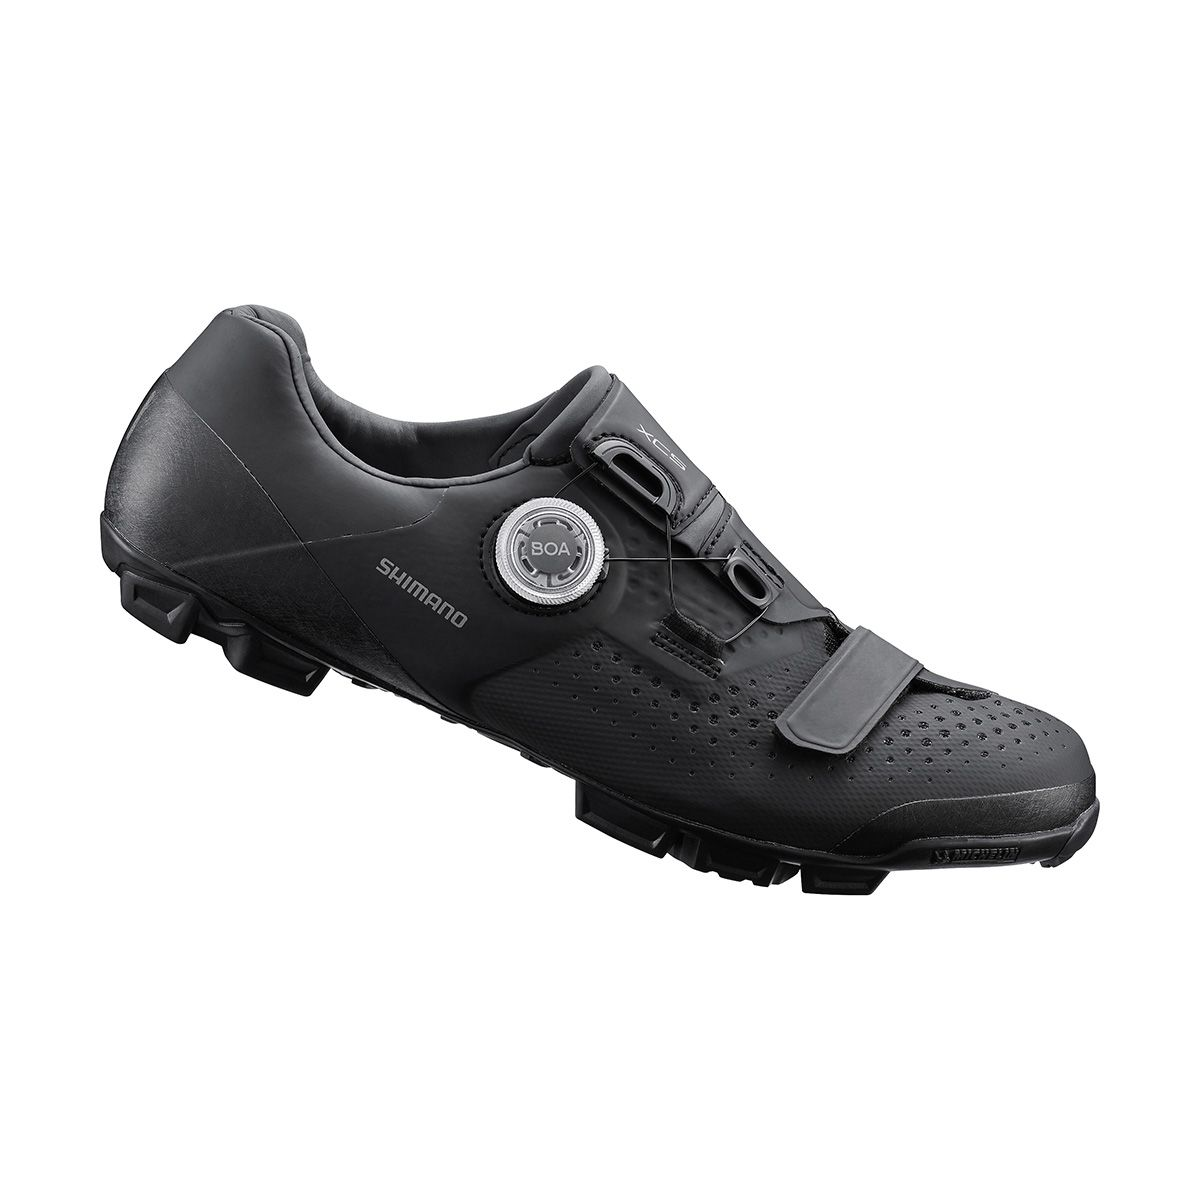 Shimano Chaussures VTT XC501 Noire